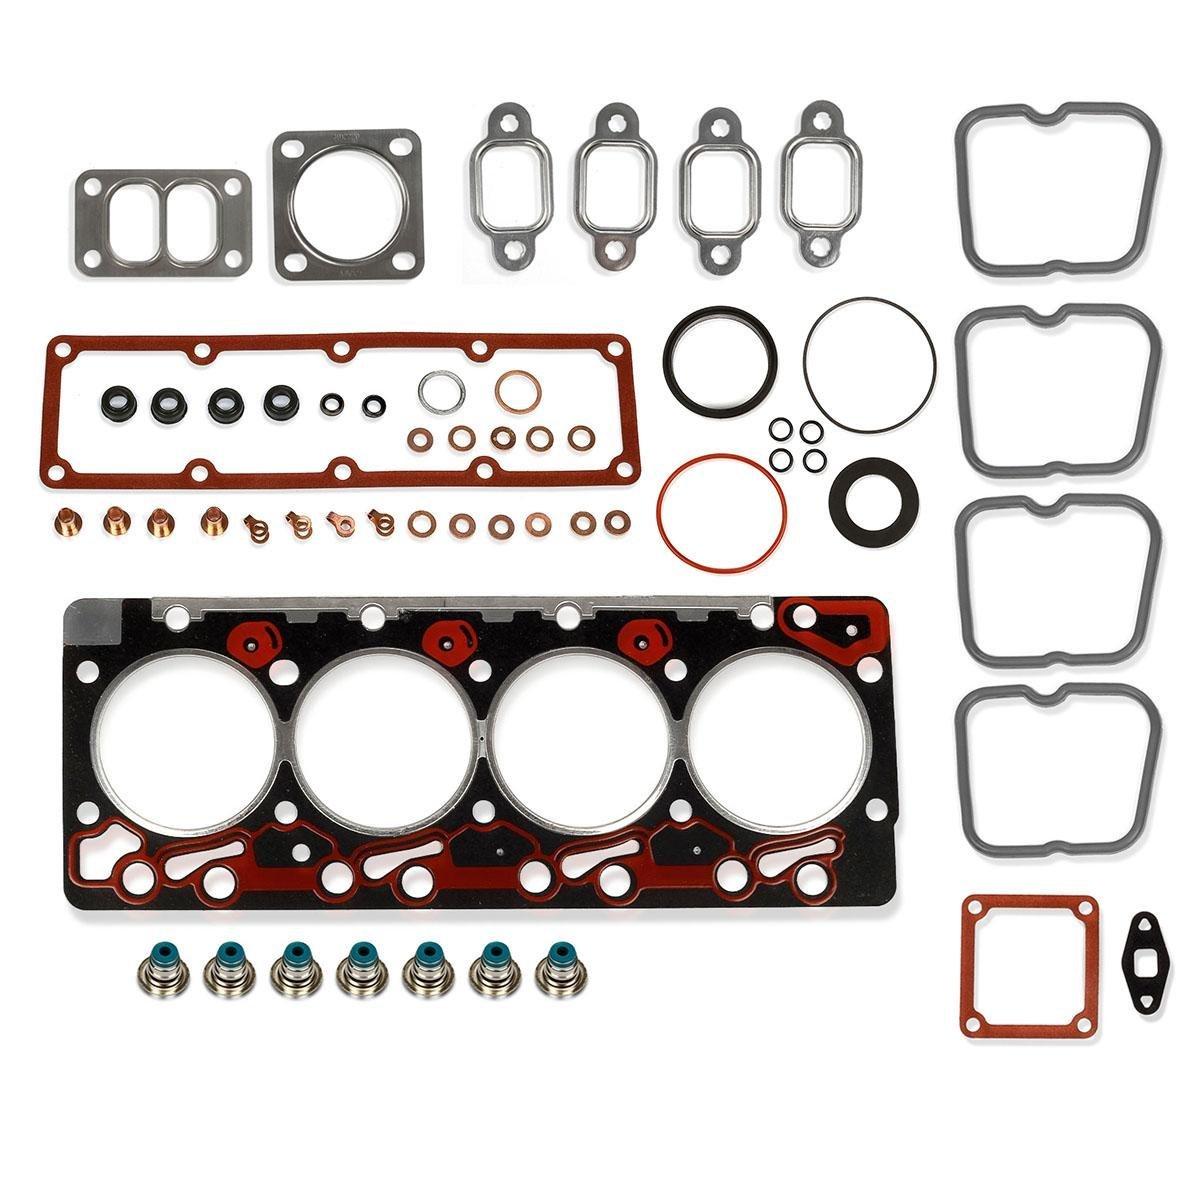 Fits For 89-93 CUMMINS DIESEL 3.9L 4CYL Head Gasket Set 3804896